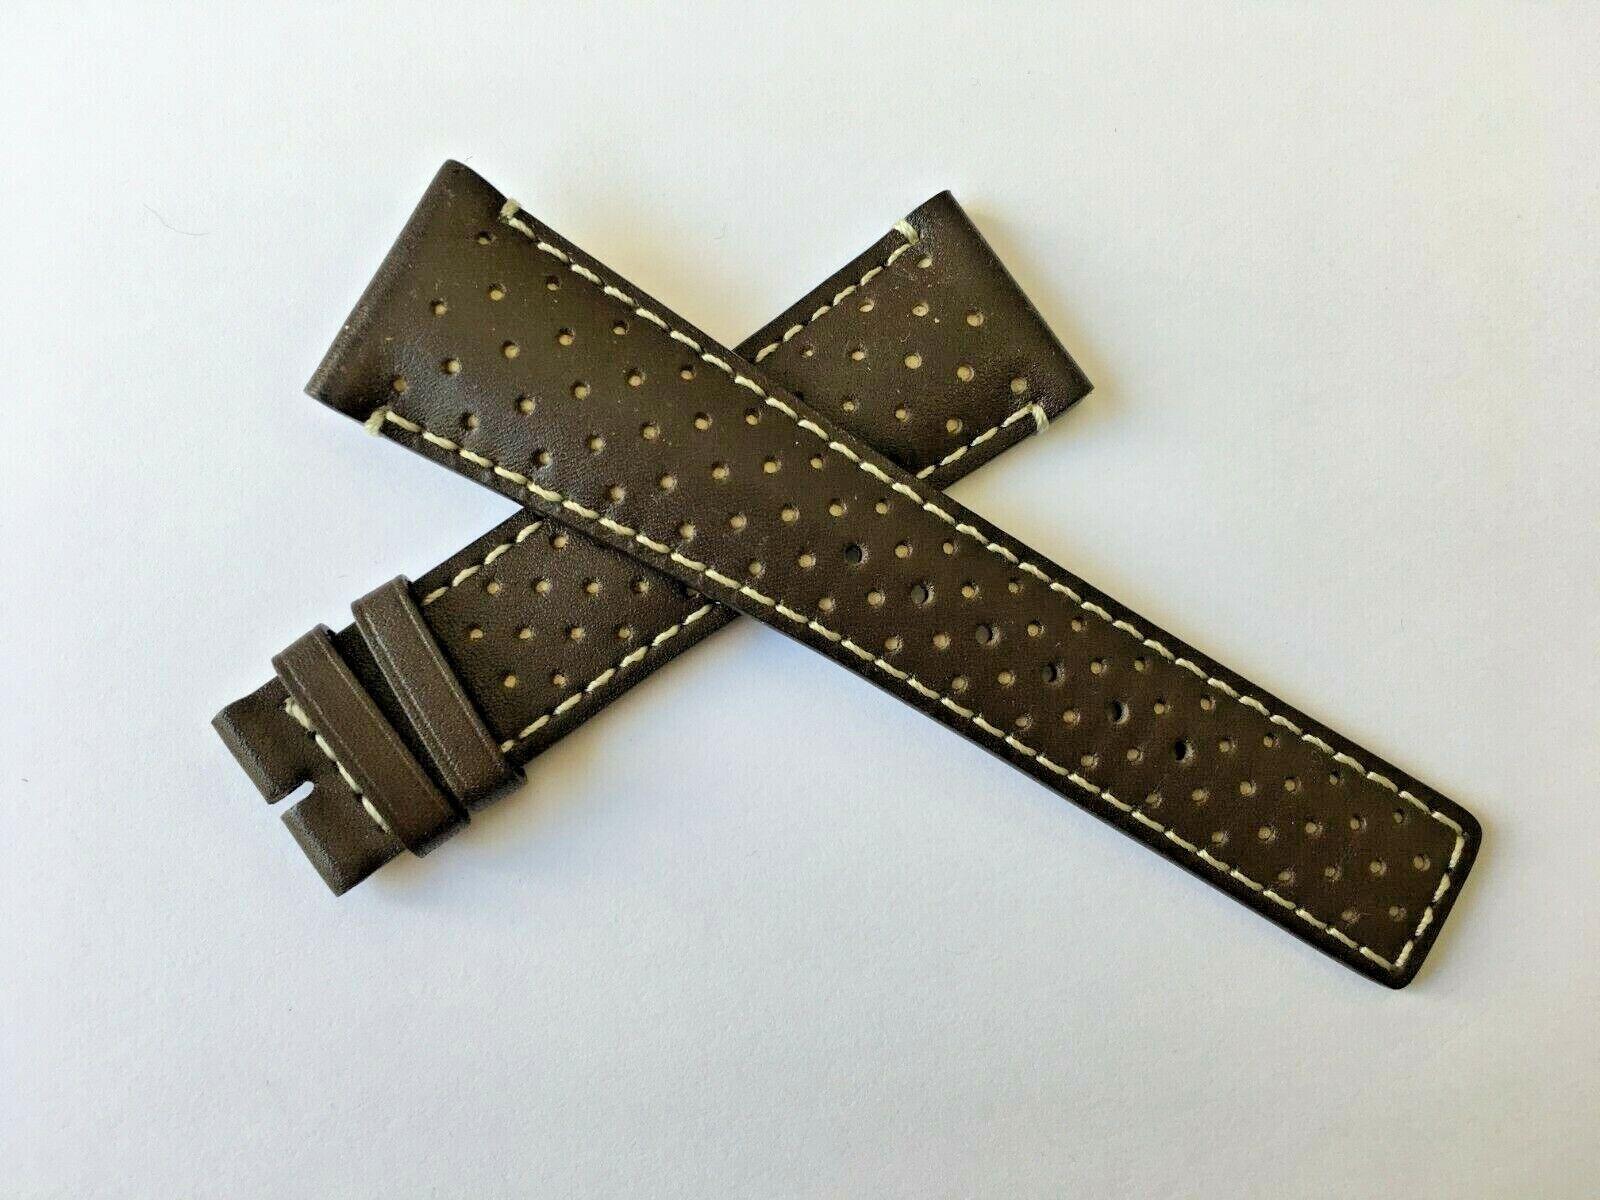 Original Gucci Leder Uhrenarmband 23mm YDA 16106 101M